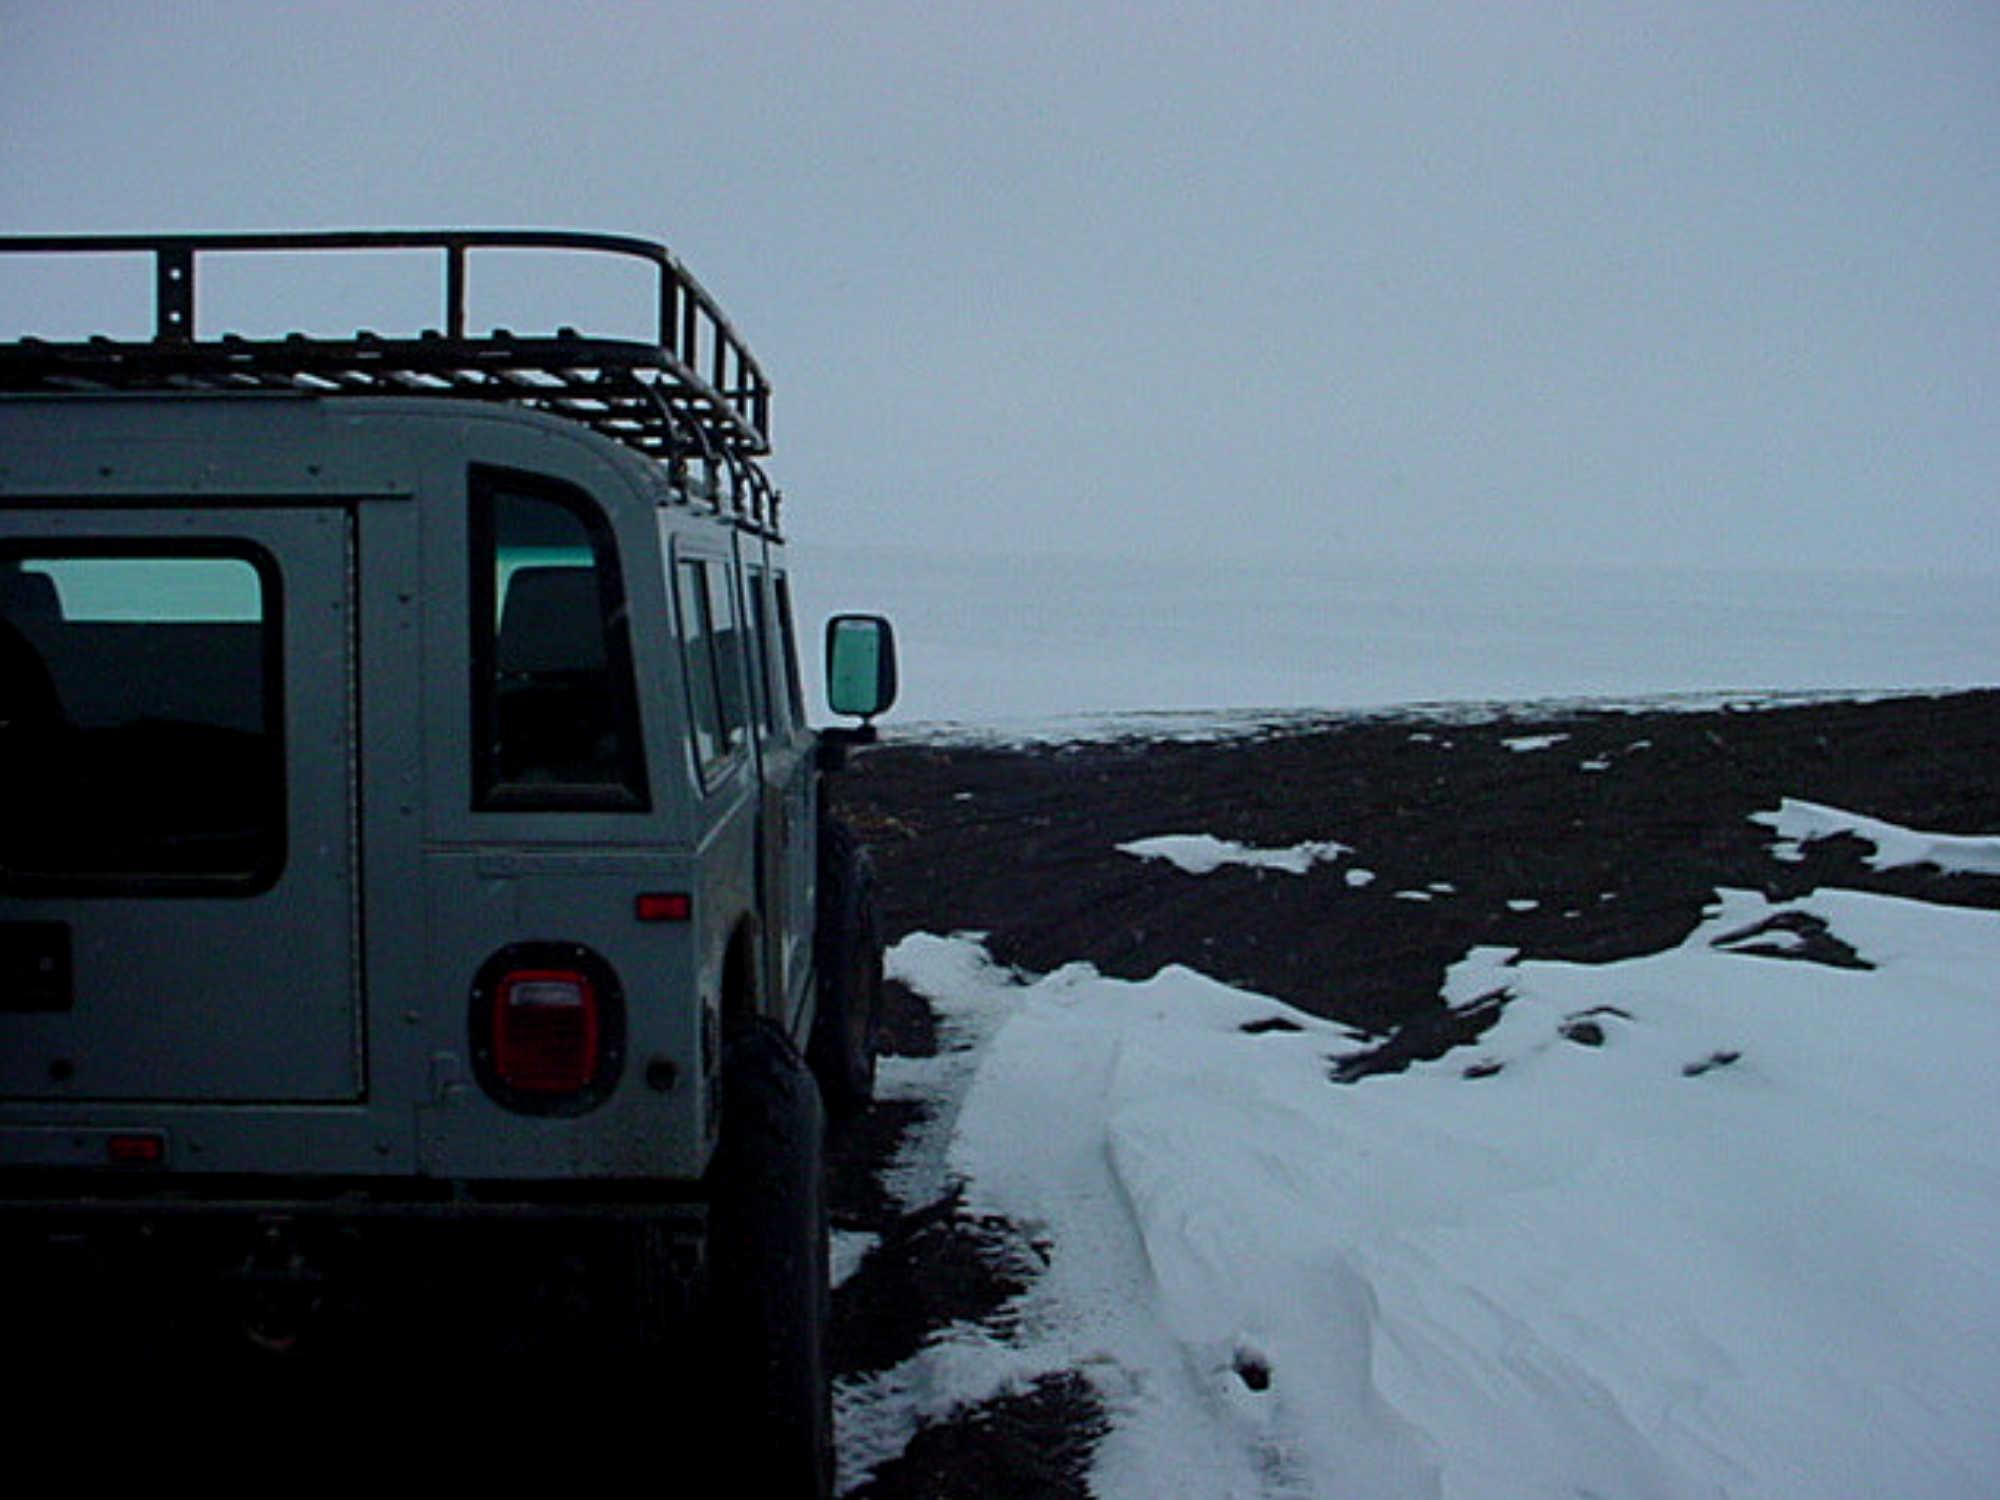 How to get to Point Barrow, Alaska?